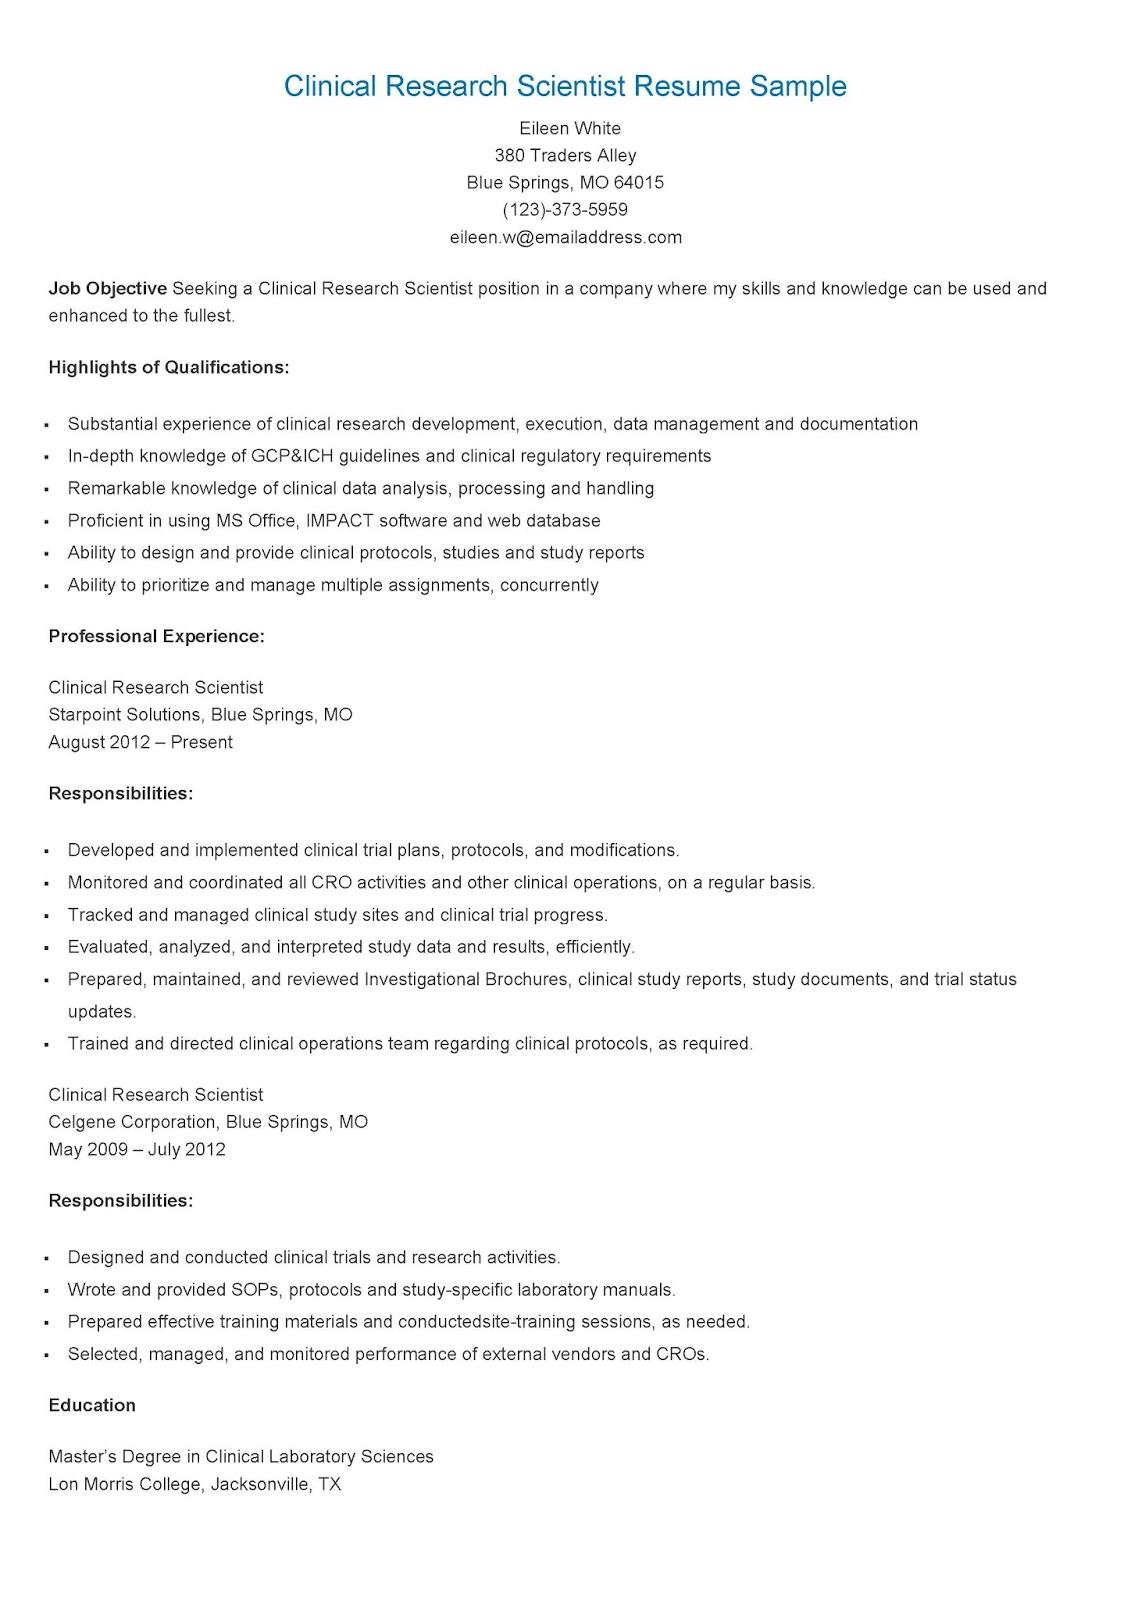 foto de Resume Samples: Clinical Research Scientist Resume Sample